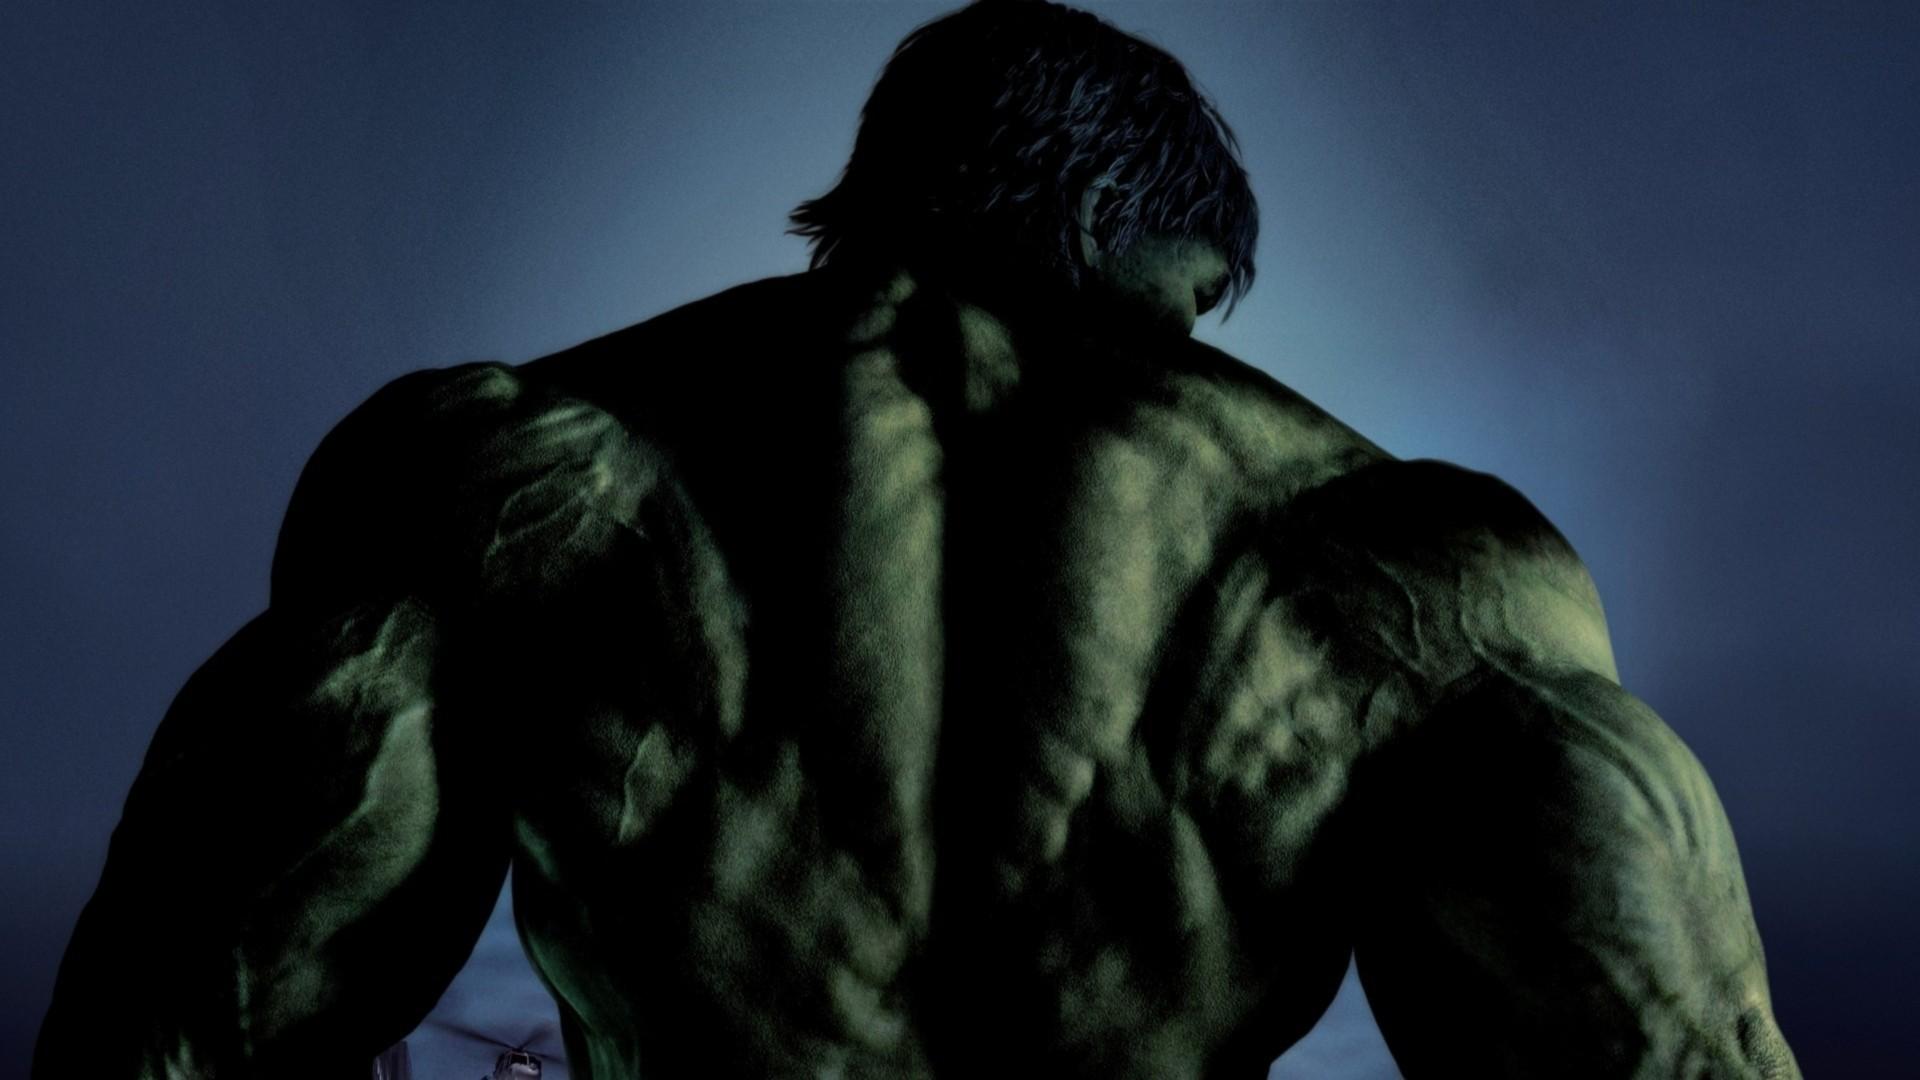 Hulk Incredible Hulk Back View 915600 Hd Wallpaper